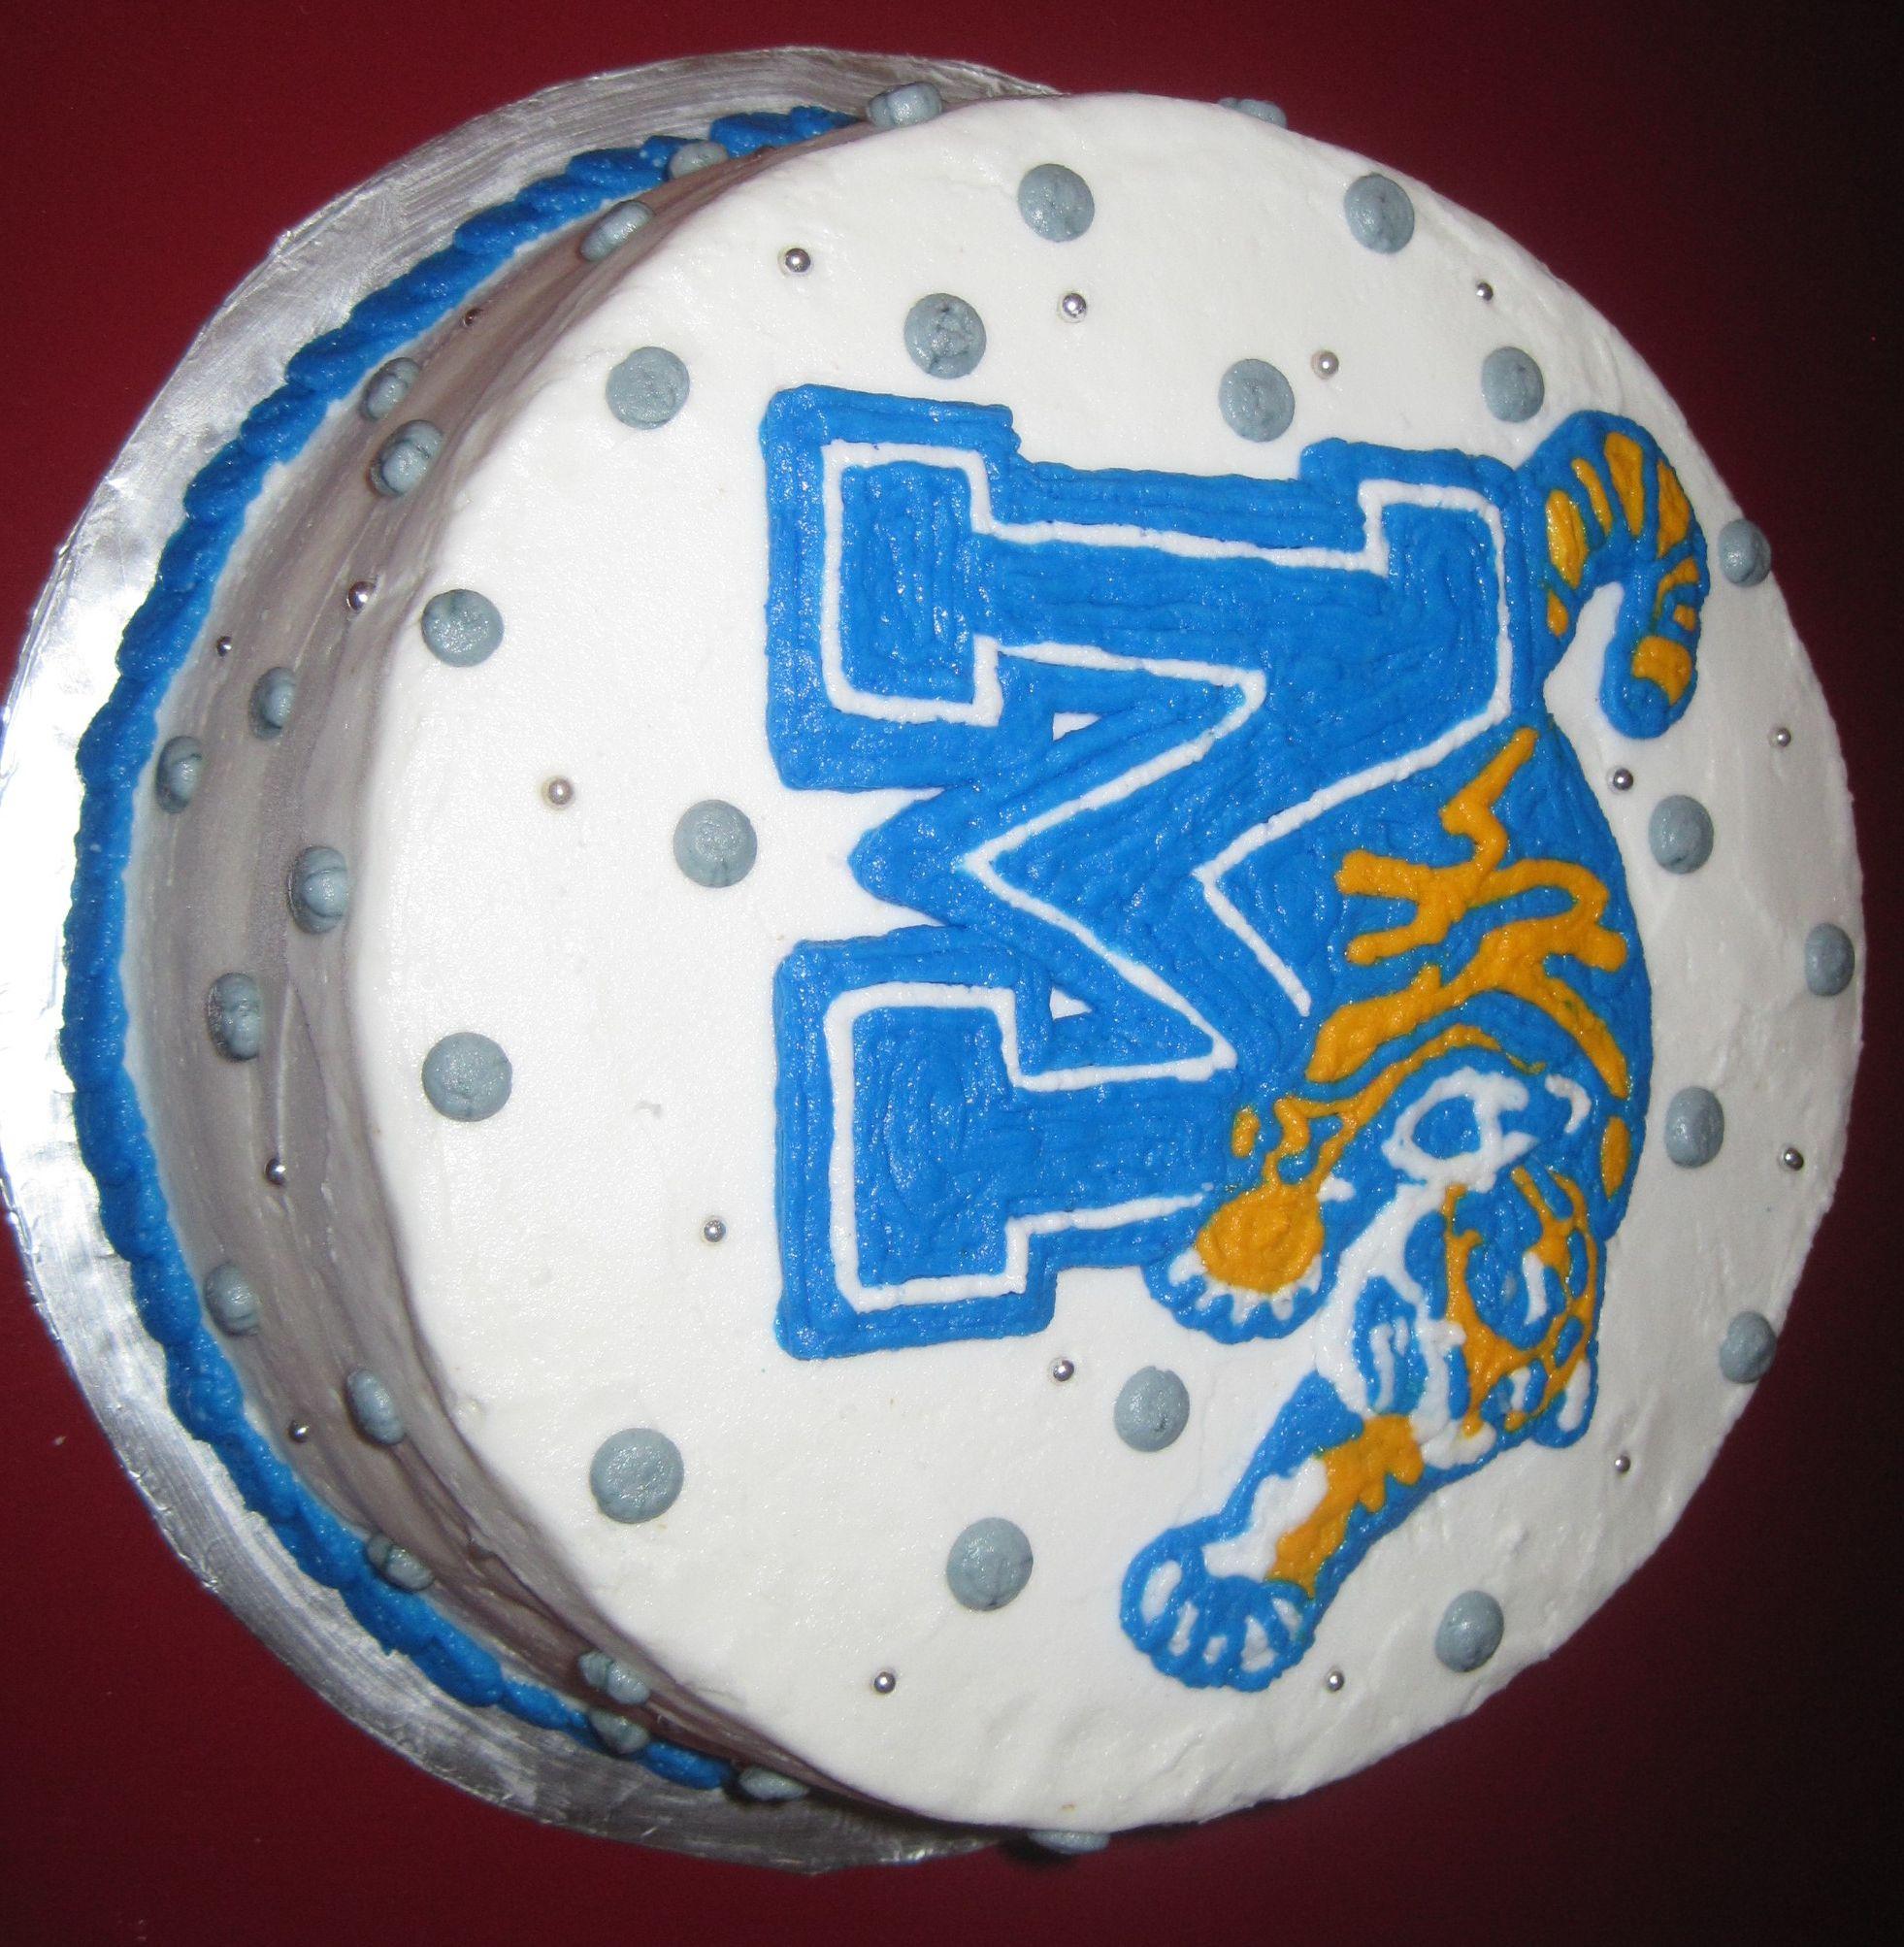 University Of Memphis Cake